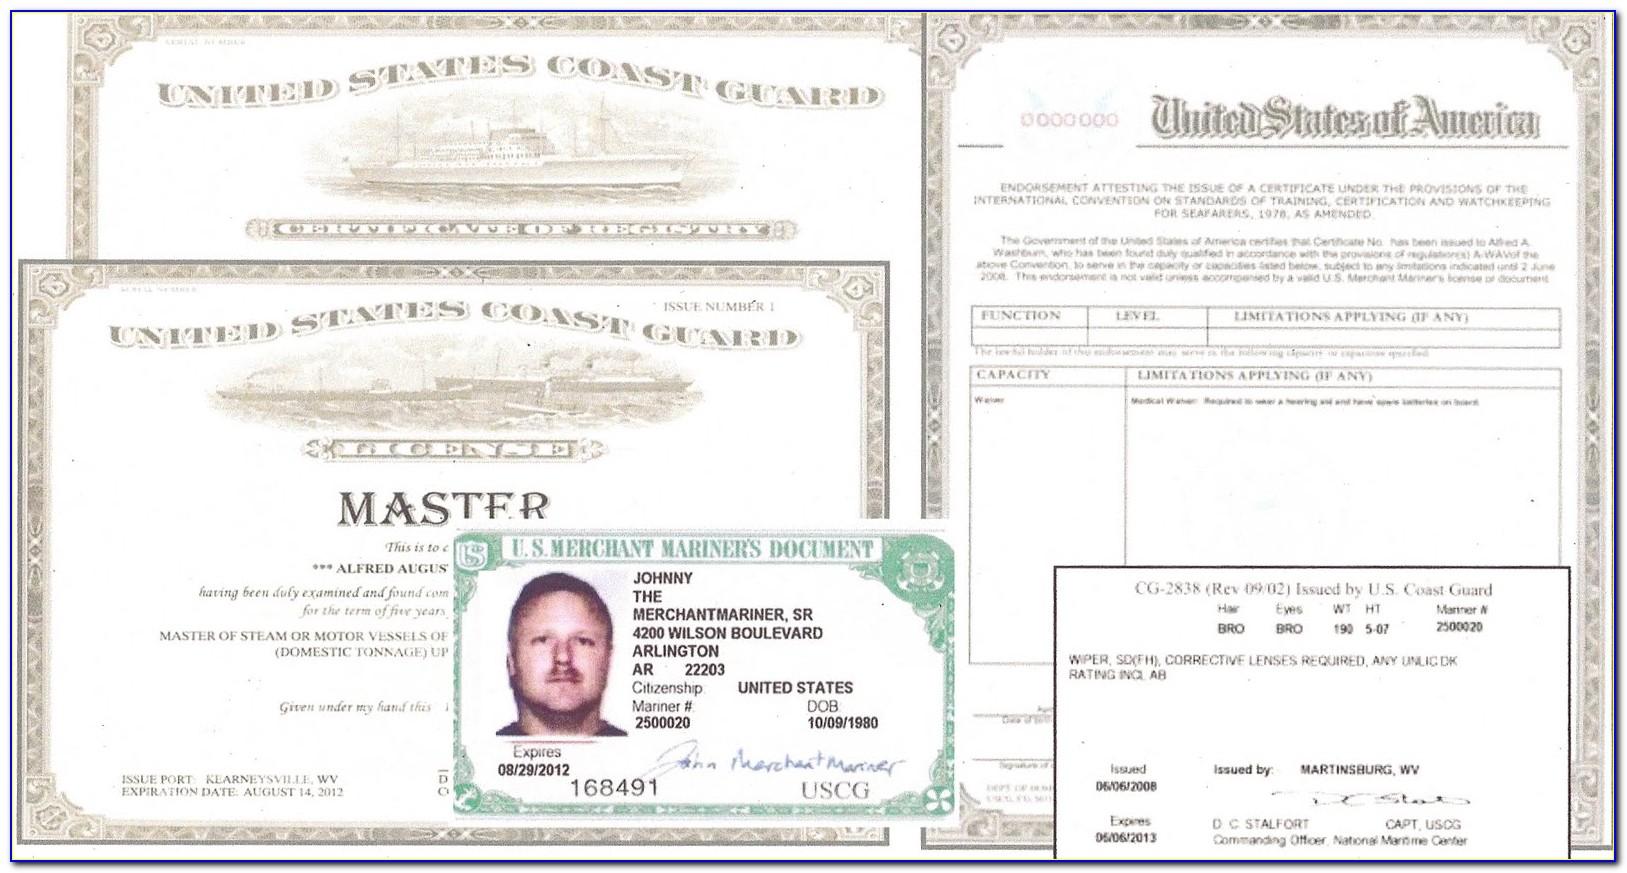 Uscg Medical Certificate Status